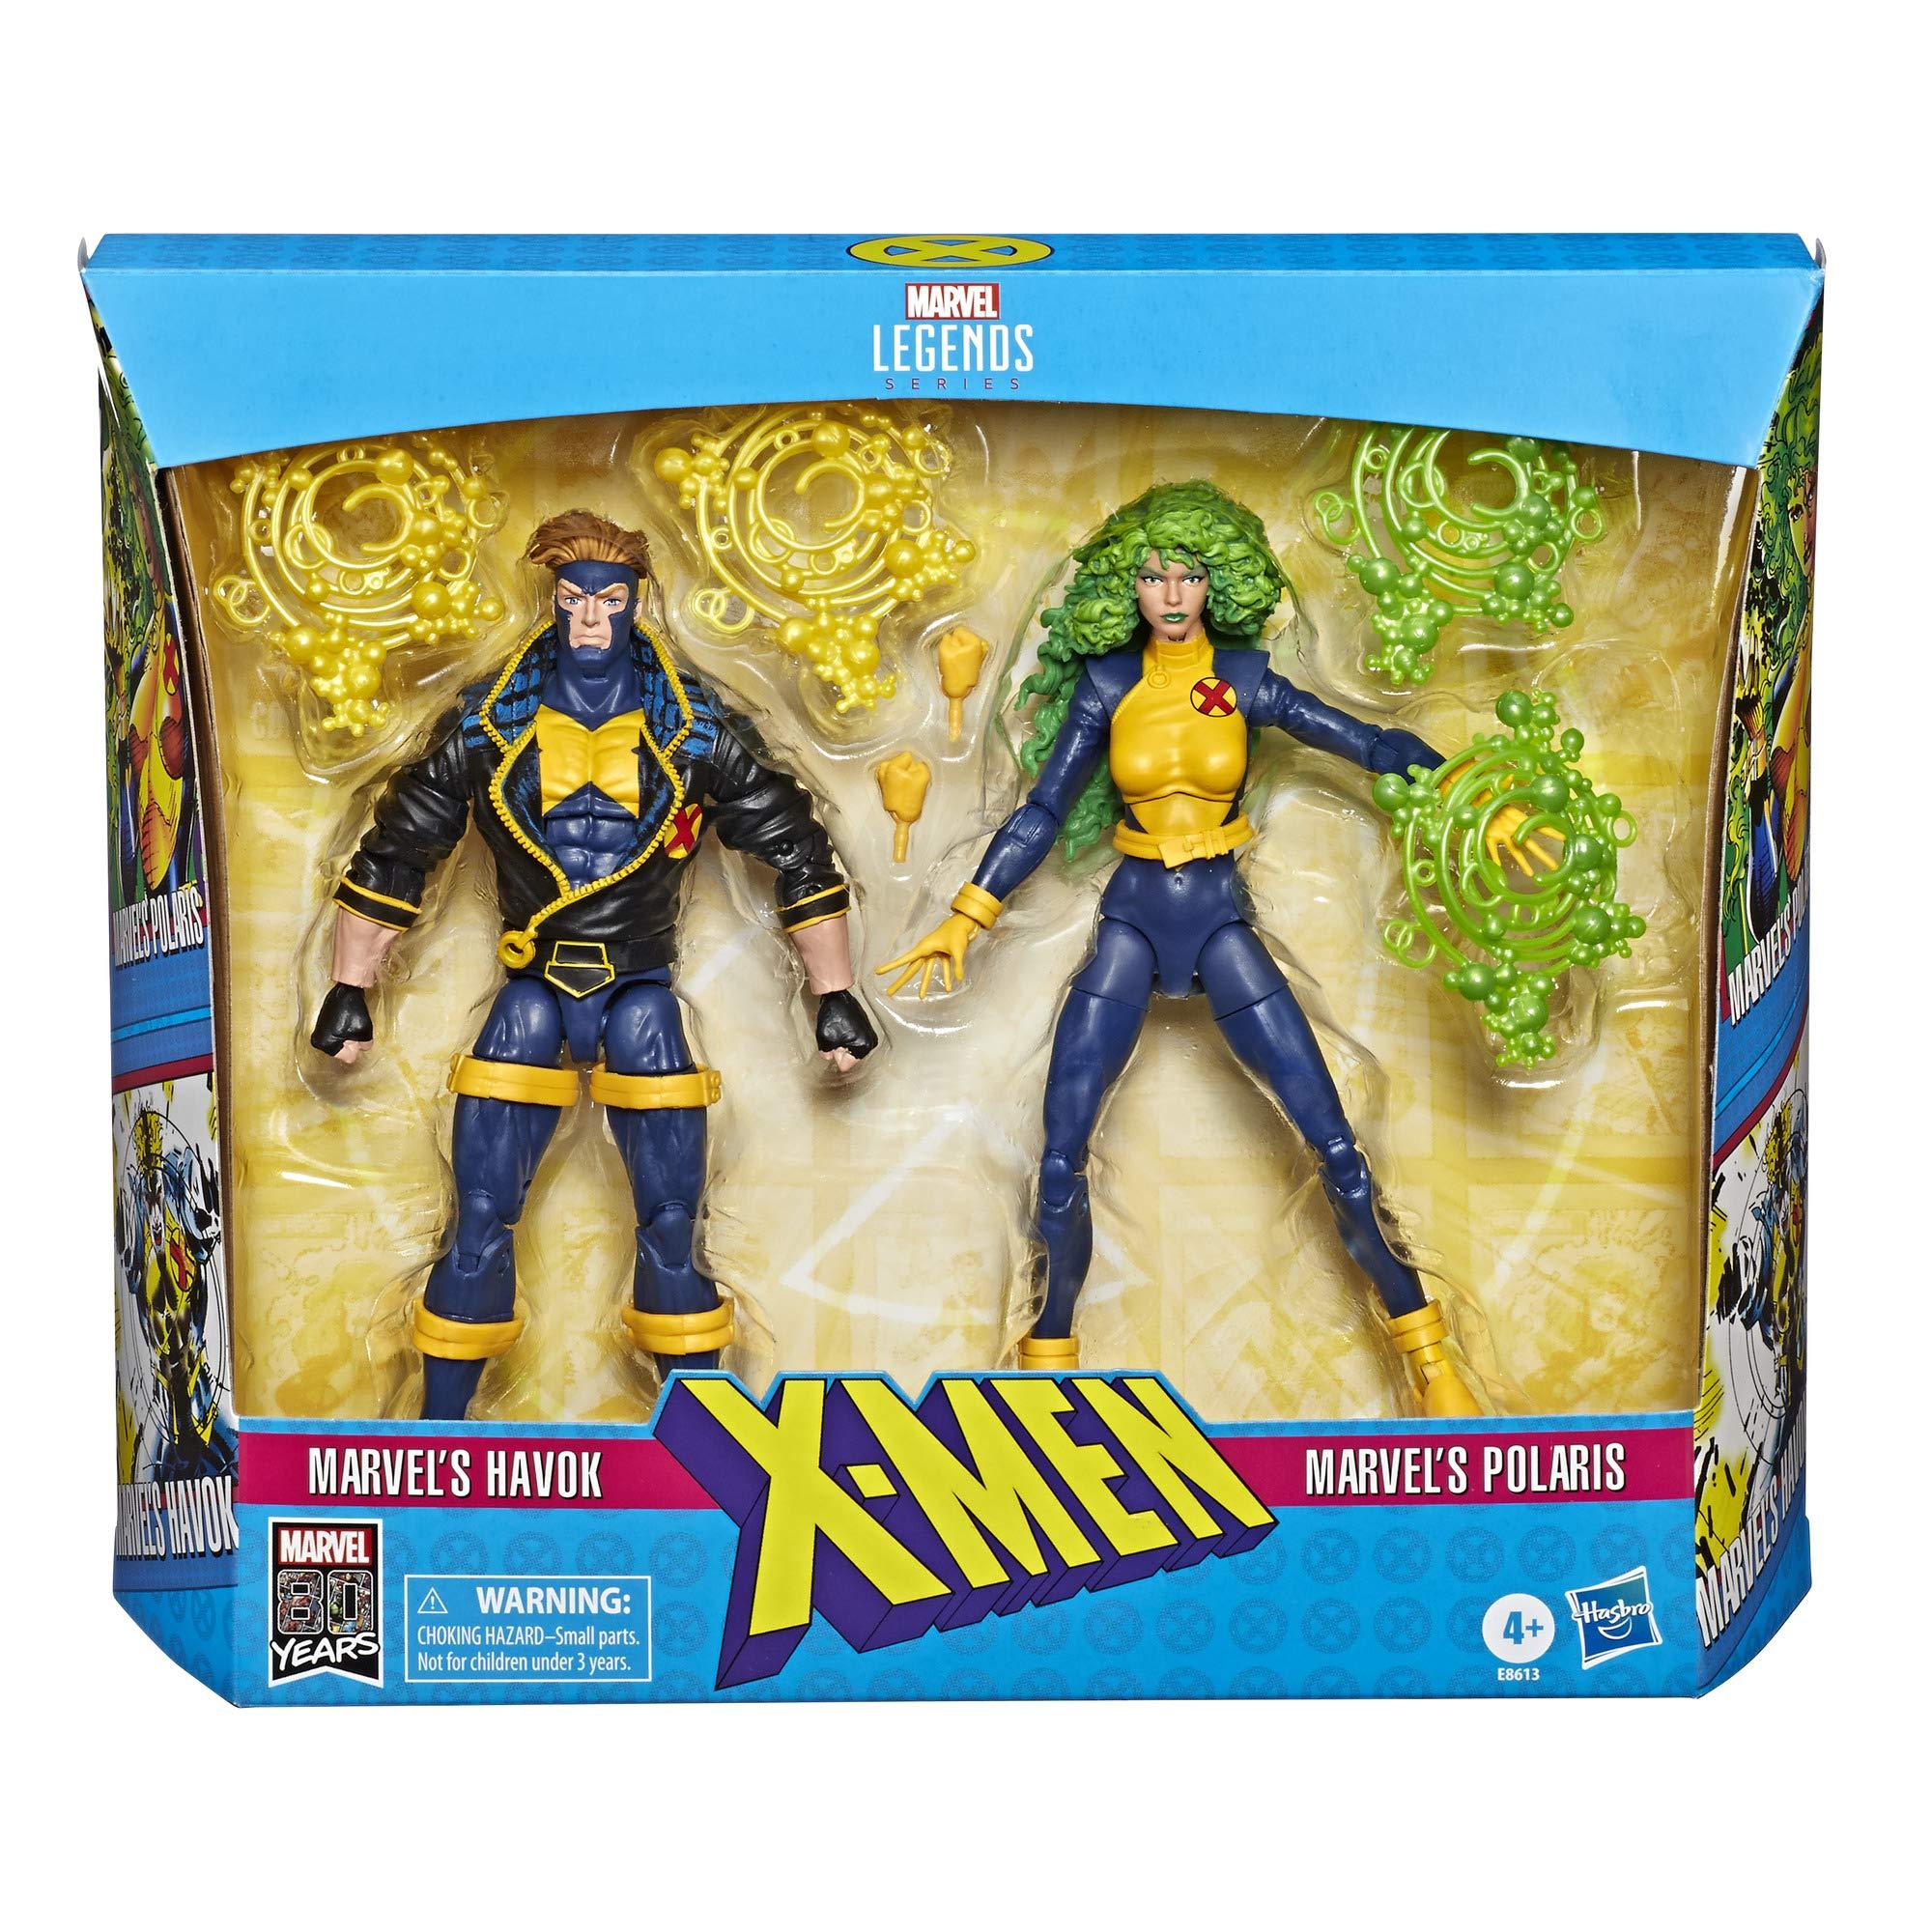 Marvel Classic- Pack of 2 X-Men 15 cm Figures, Multicolour (Hasbro E86135L0), Assorted Color/Model